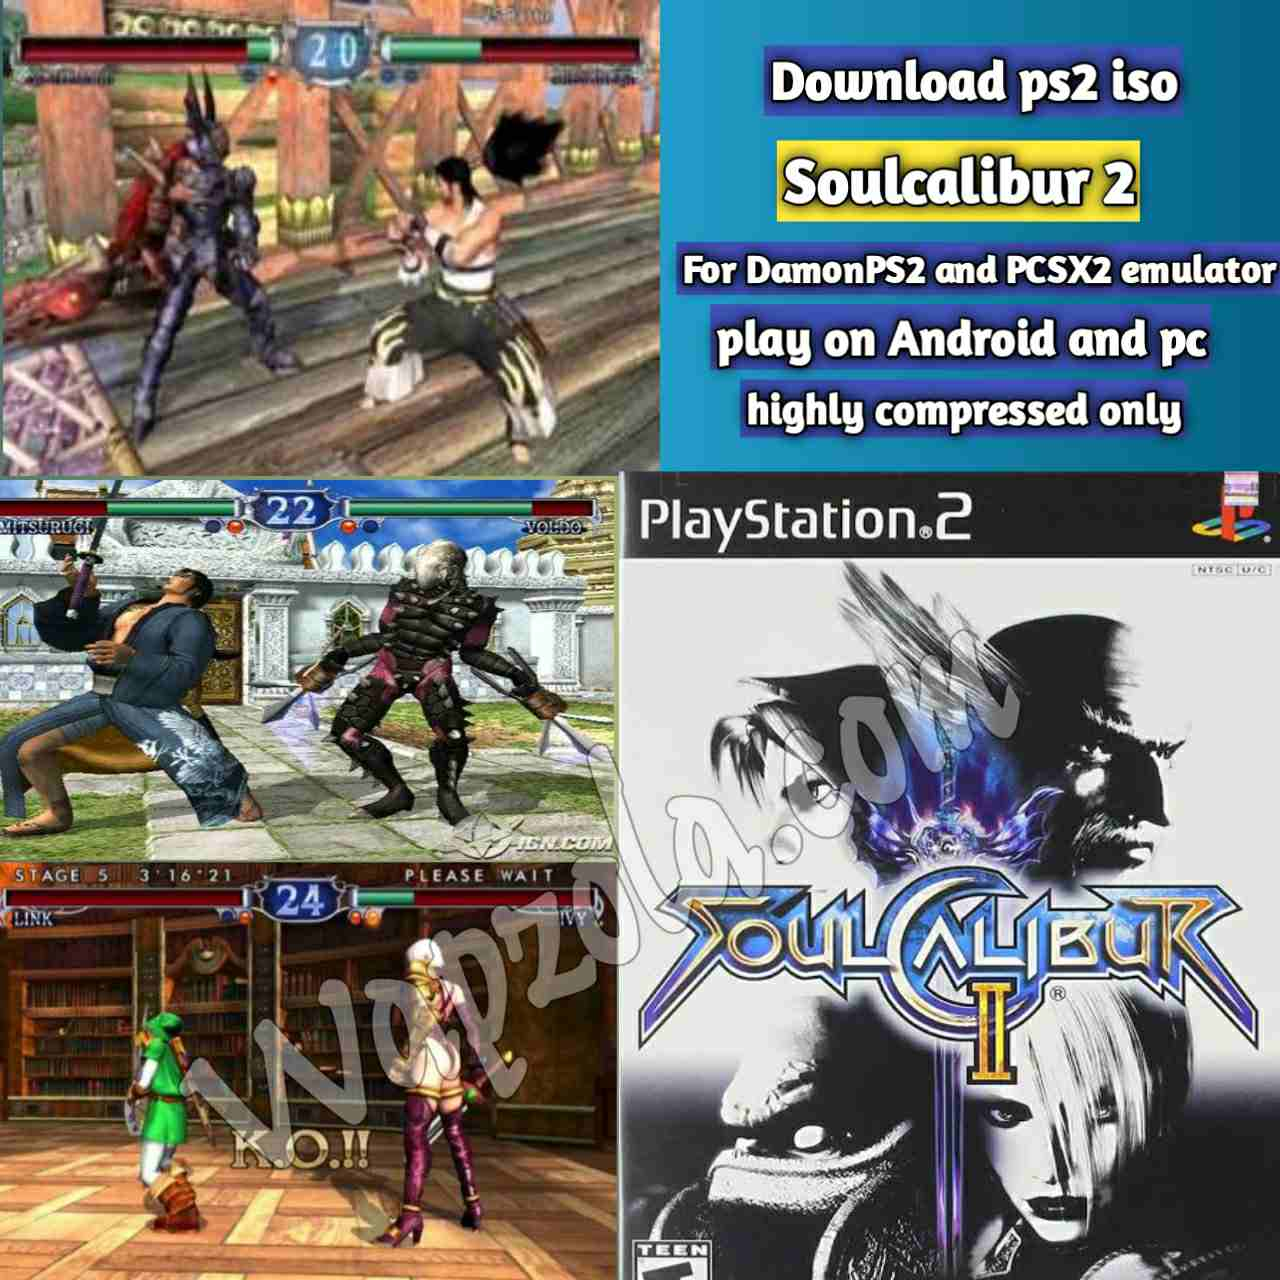 download soulcalibur-2-iso-damonps2-pcsx2-ps2-emulator highly compressed